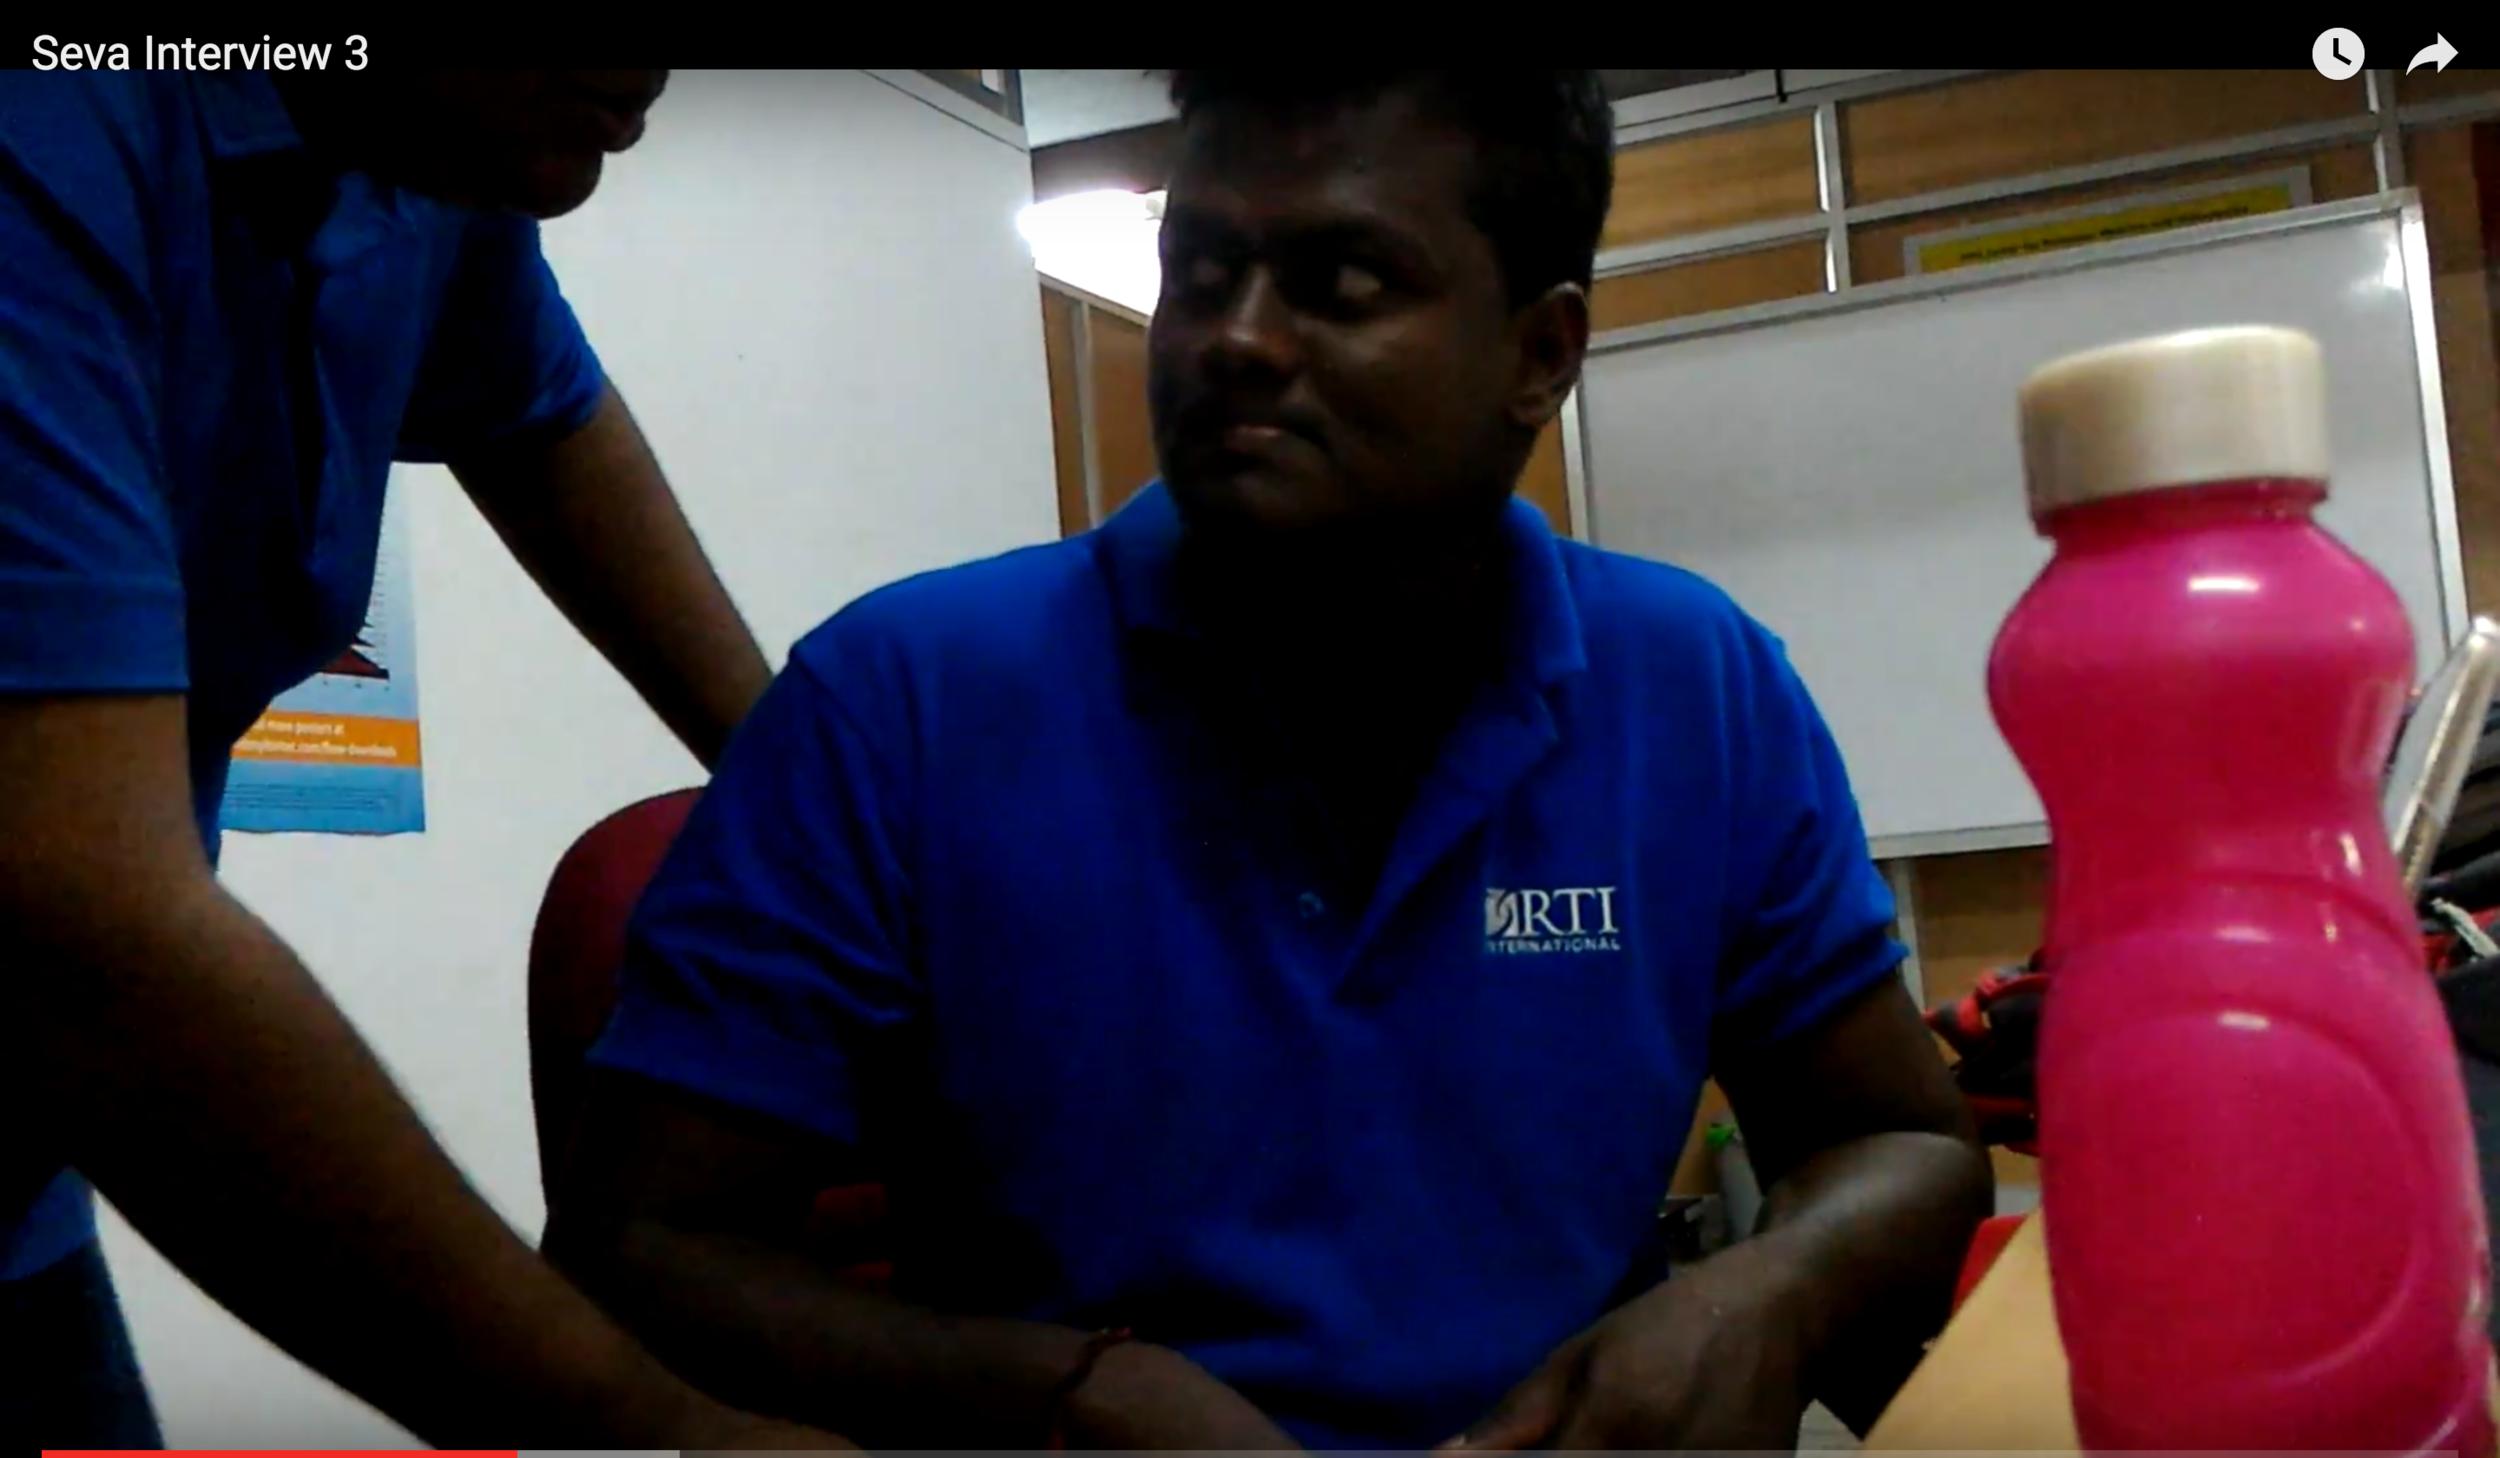 - User testing: Coimbatore, India